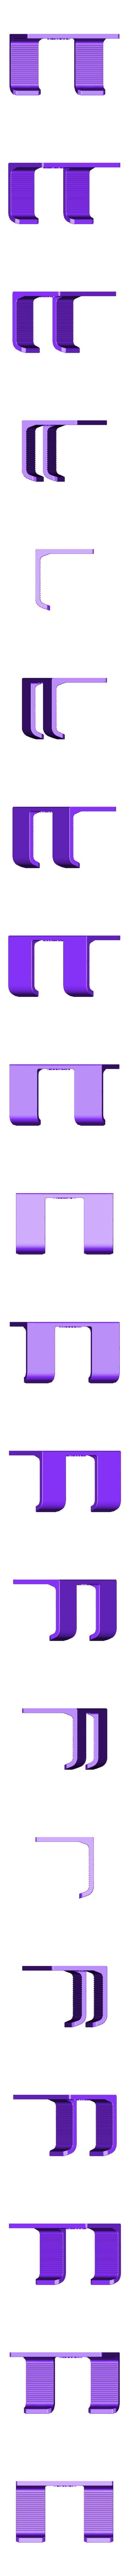 enforce_1000_screws.stl Download free STL file Club Hammer 1000 Grams holder 038 I ENFORCE I for screws or peg board • 3D printer template, Wiesemann1893